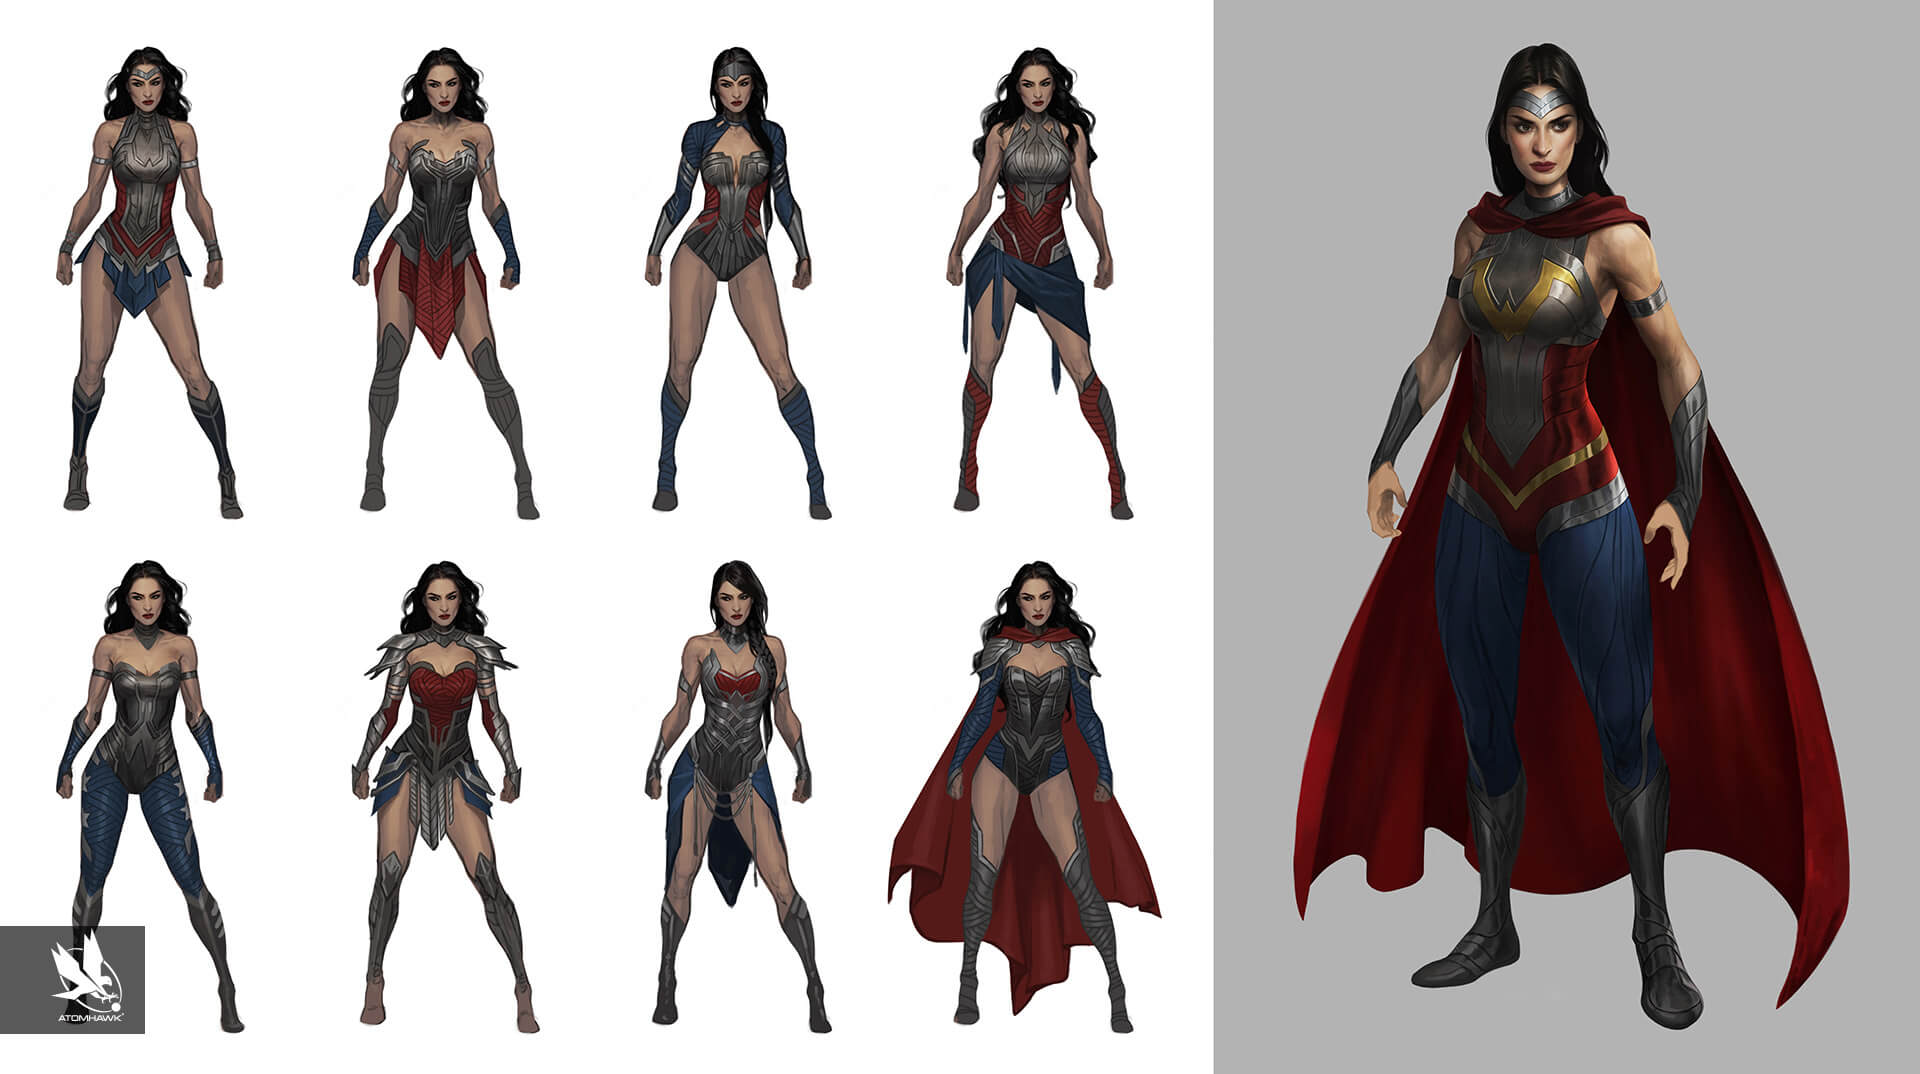 Atomhawk_Warner Bros Nether Realm_Injustice 2_Concept Art_Character Design_Wonder Woman_Services.jpg